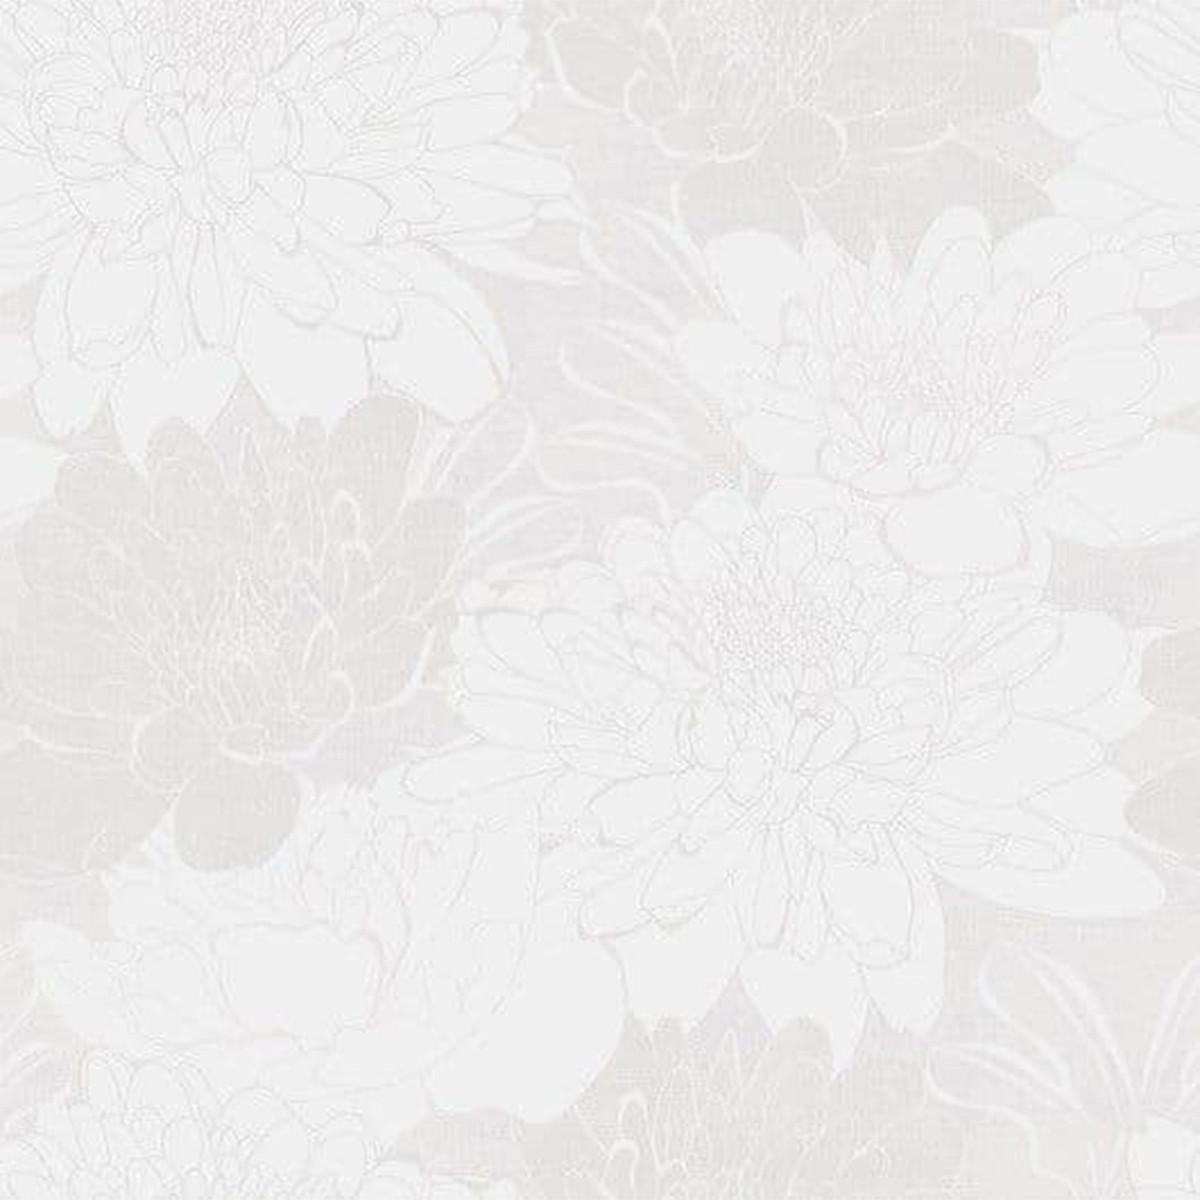 Обои флизелиновые Collection For Walls Northern Feelings белые 0.53 м 203501